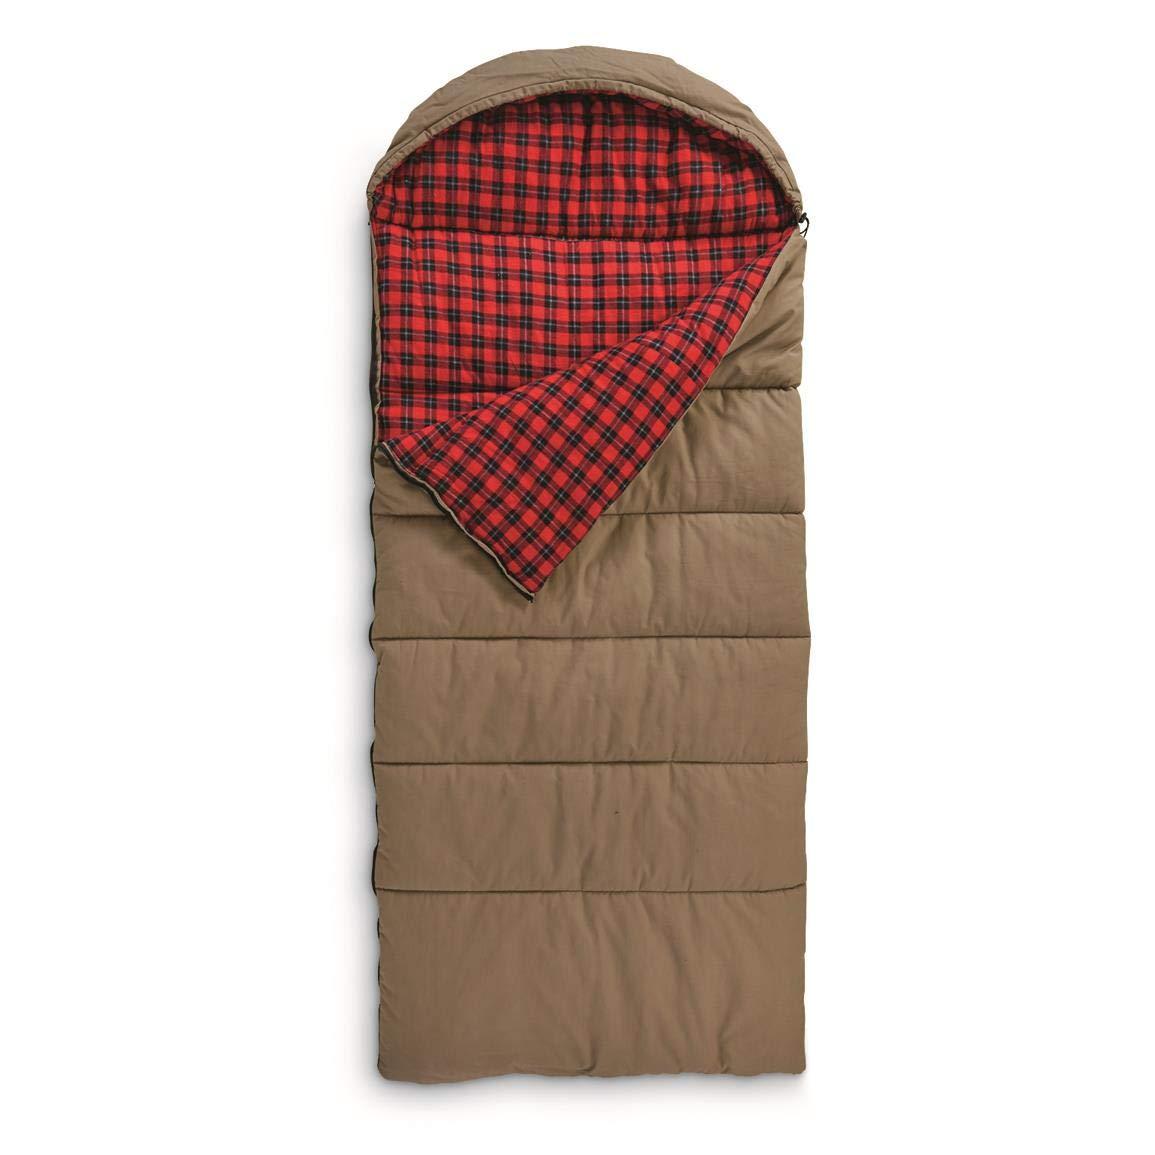 Guide Gear Canvas Hunter Sleeping Bag, 0°F